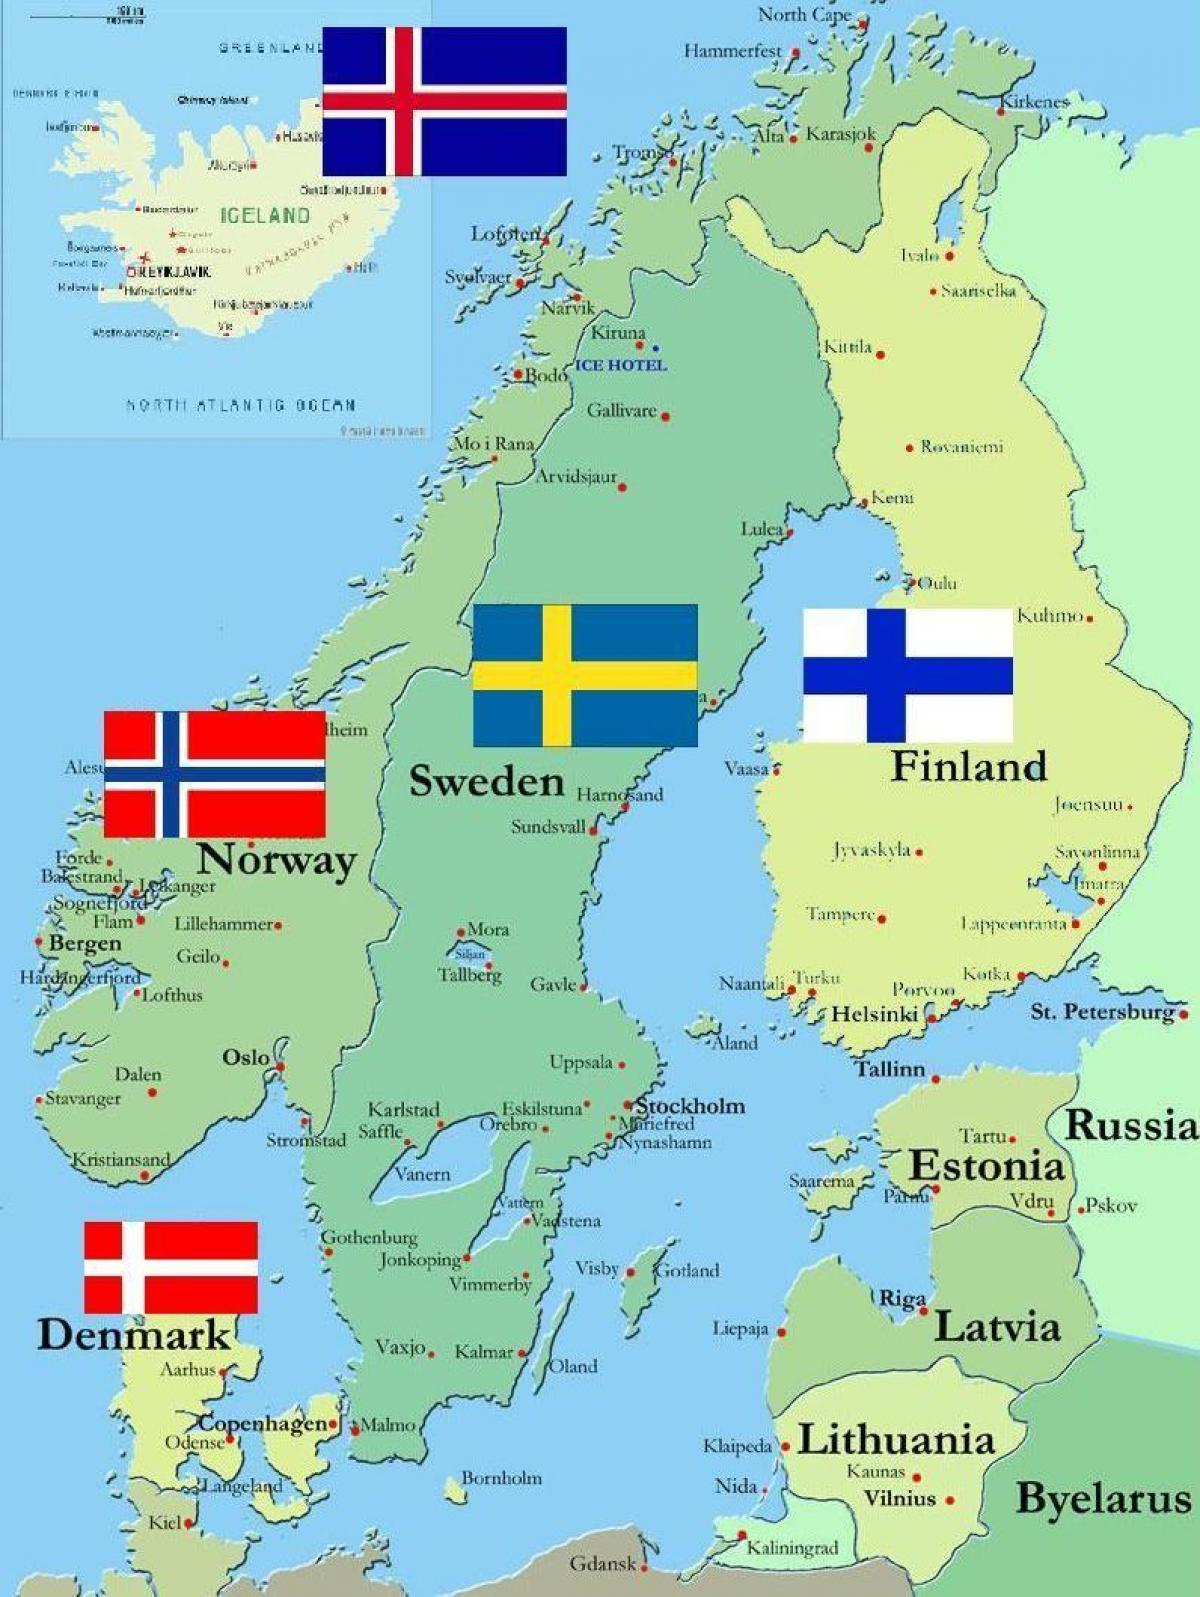 Karta Lander I Europa.Karta Over Sverige Och Omgivande Lander Sverige Surround Lander